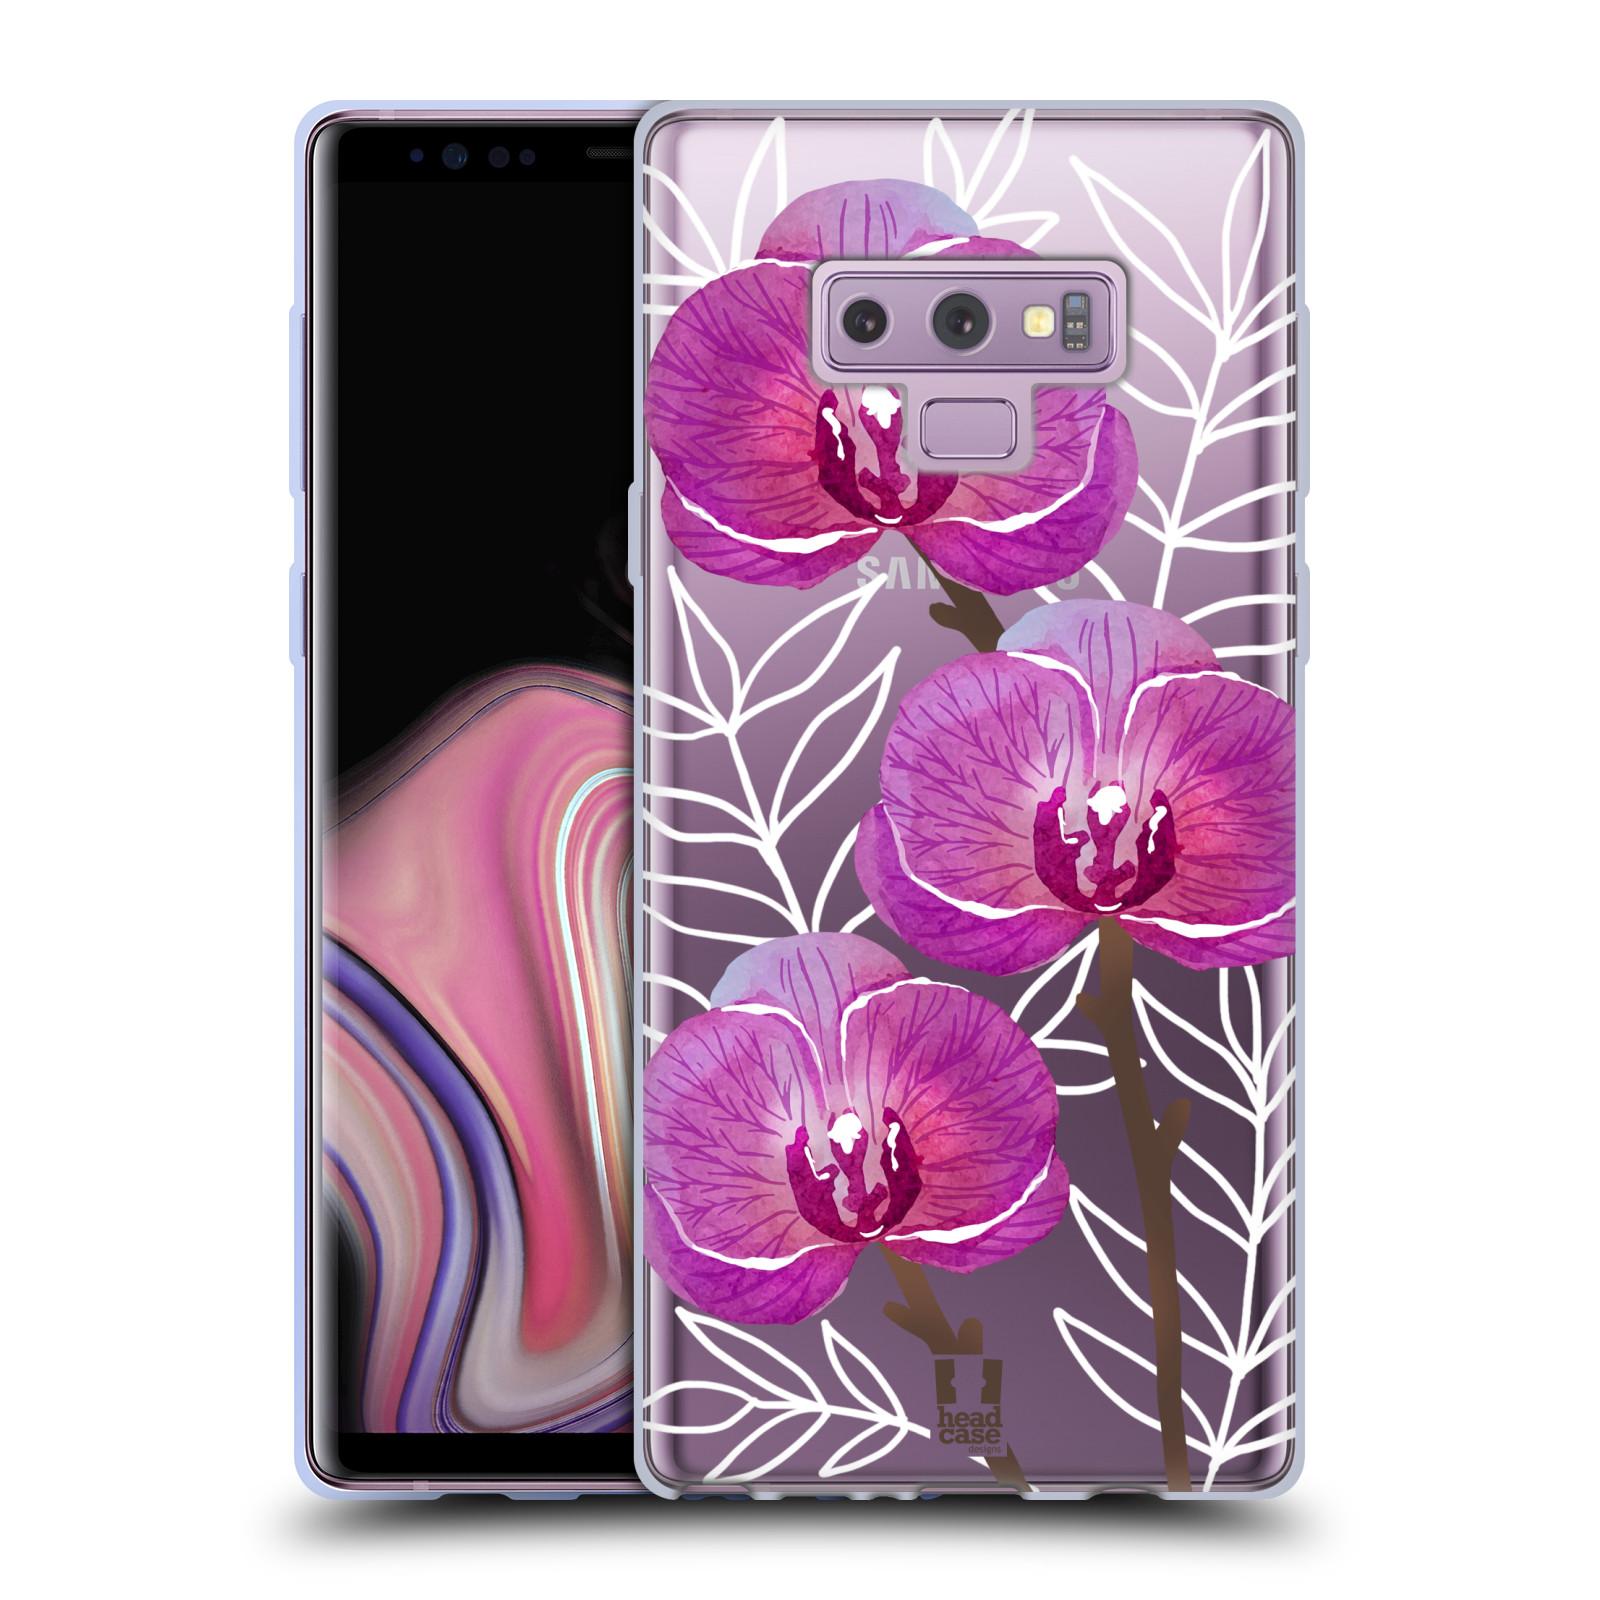 Silikonové pouzdro na mobil Samsung Galaxy Note 9 - Head Case - Hezoučké kvítky - průhledné